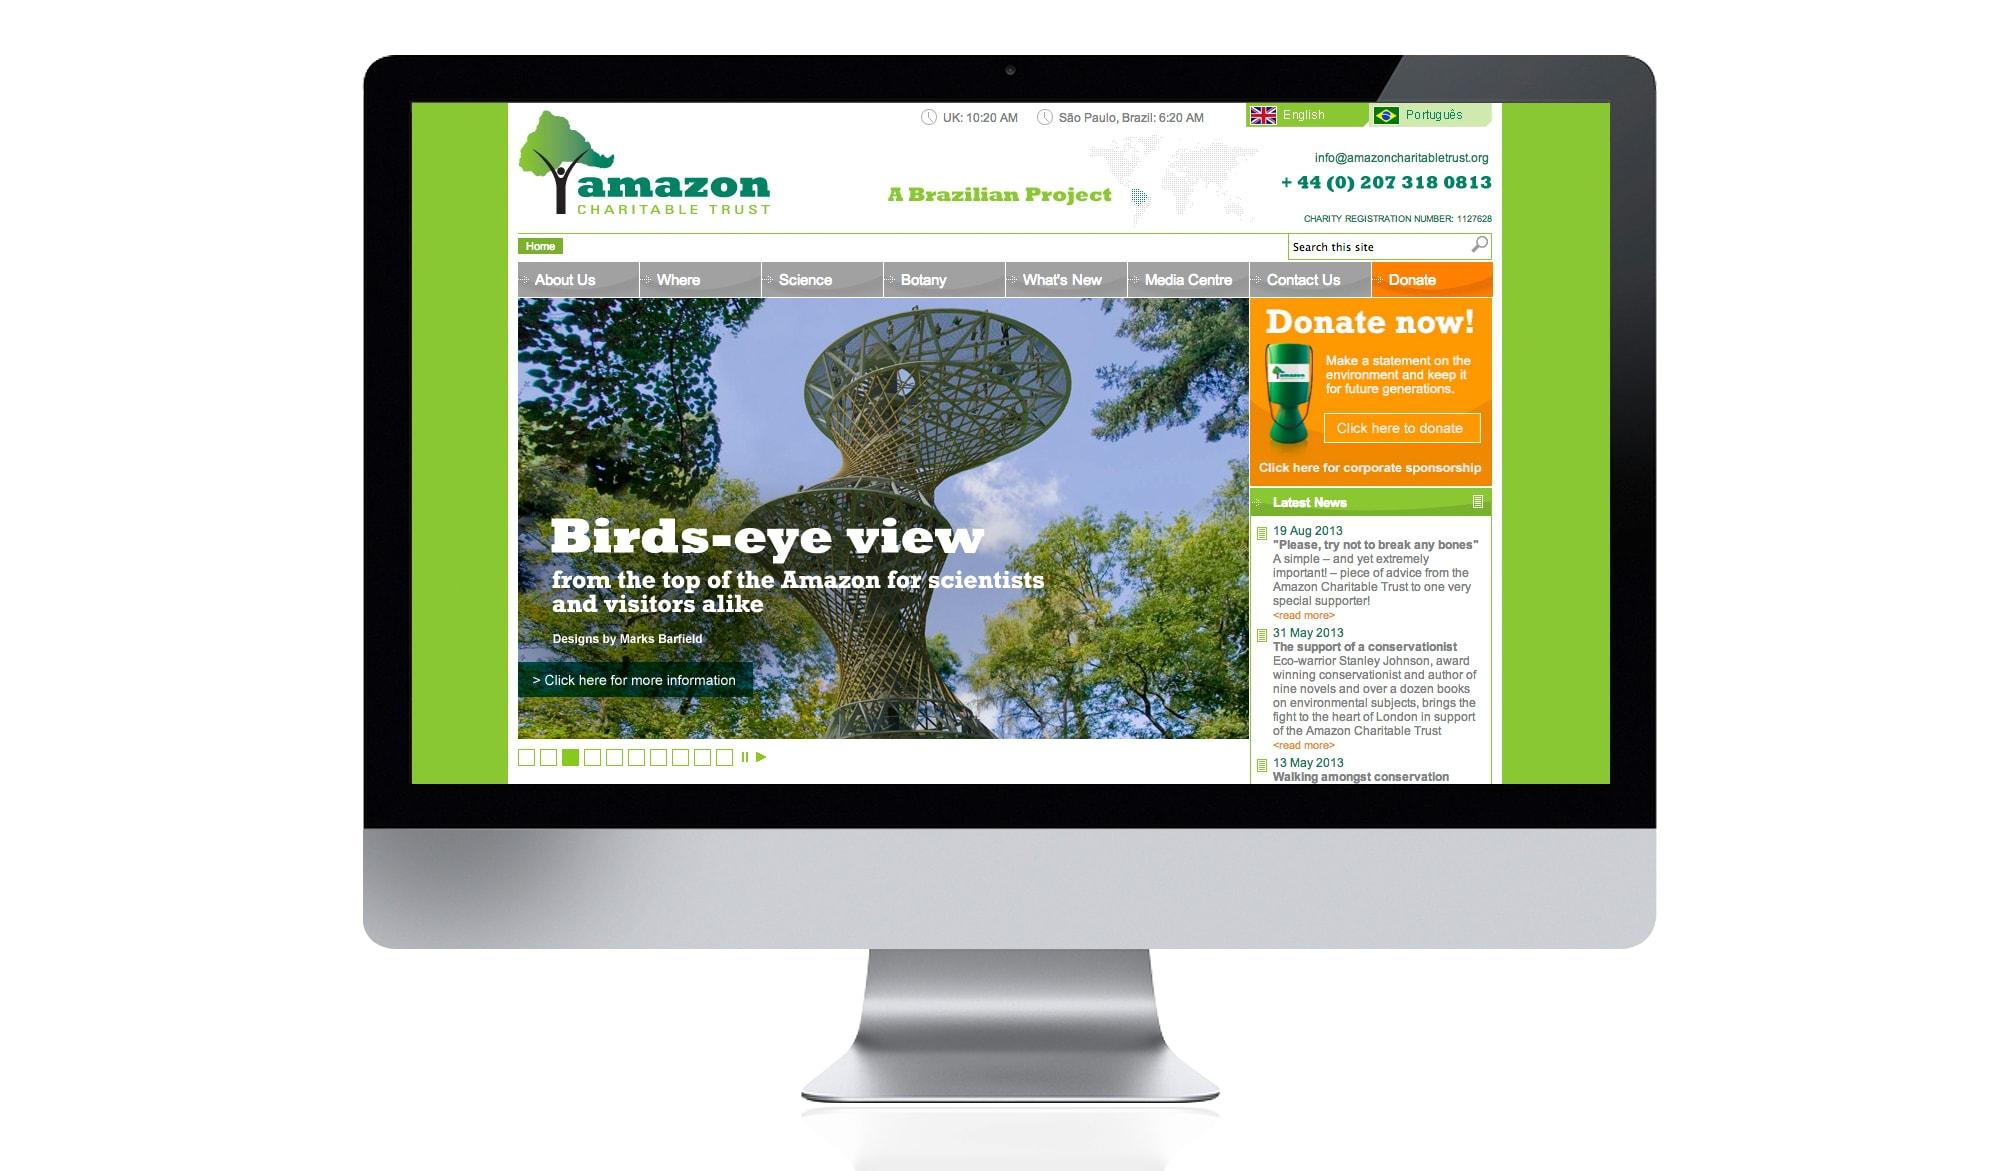 Amazon Charitable Trust - web